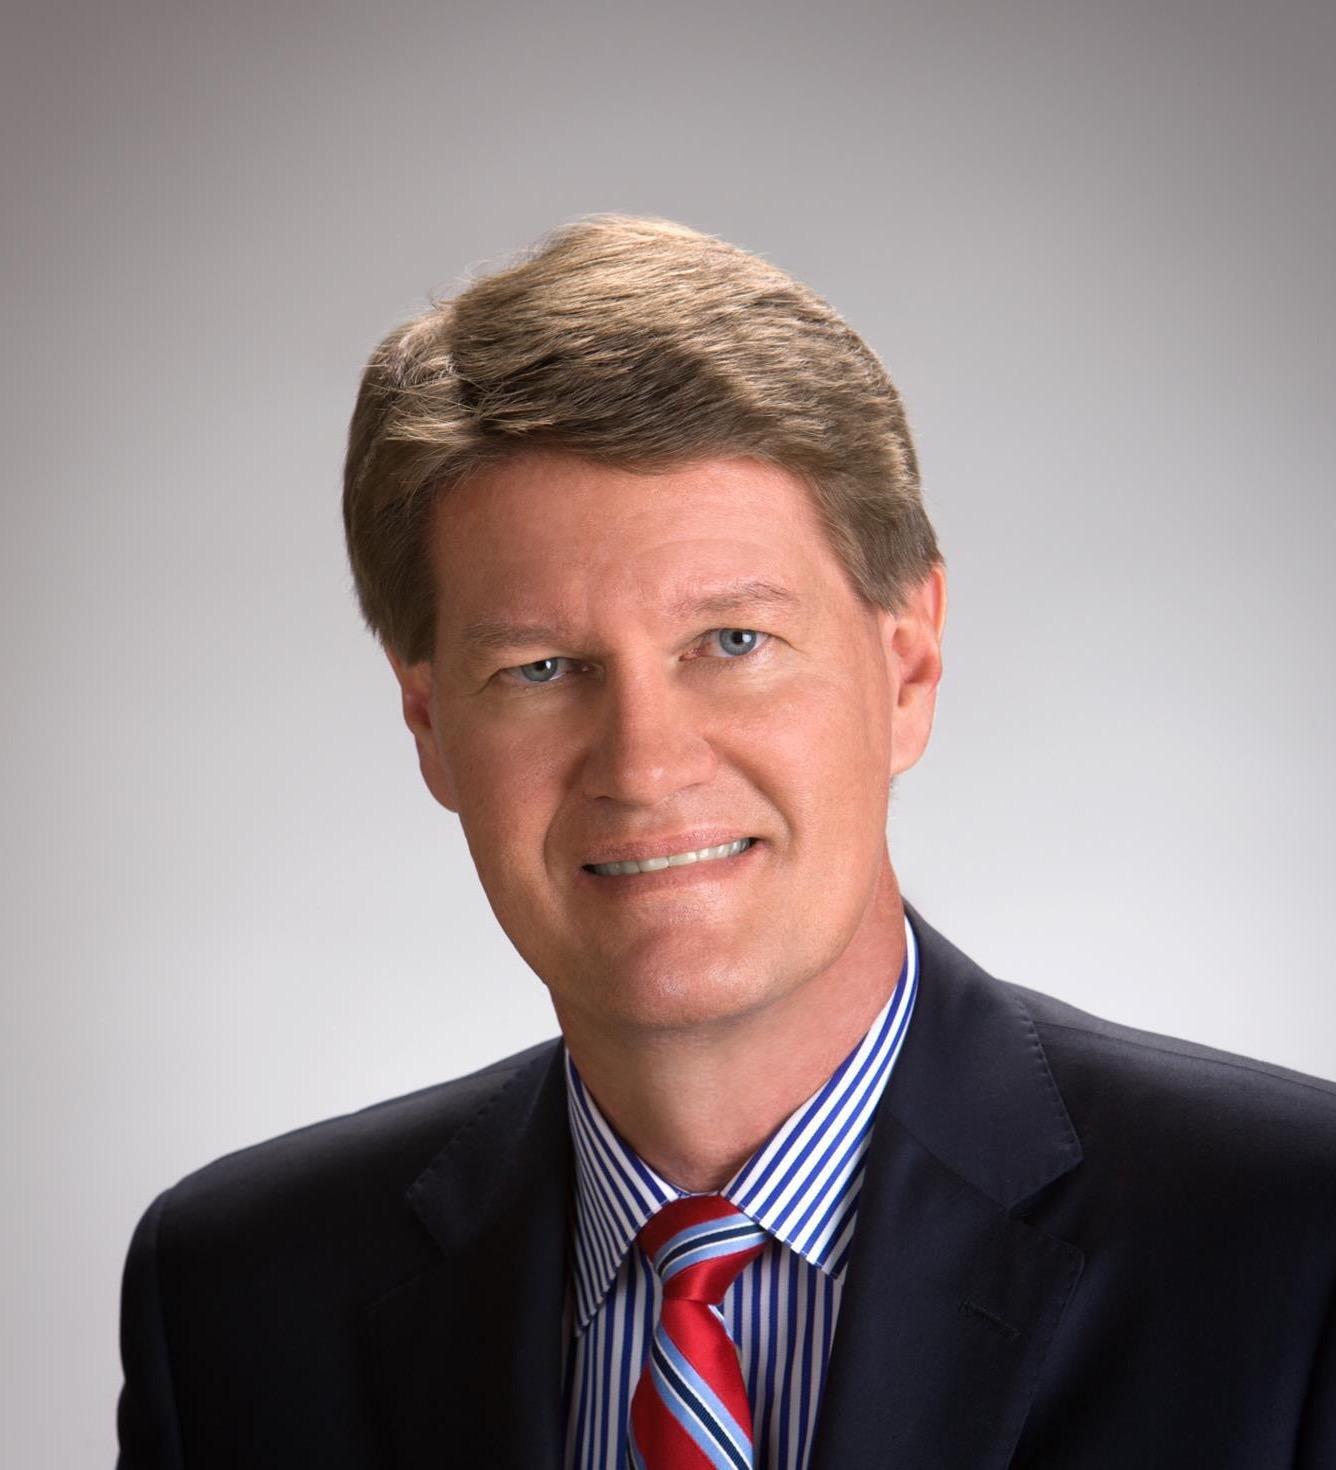 Eric D. Nielsen